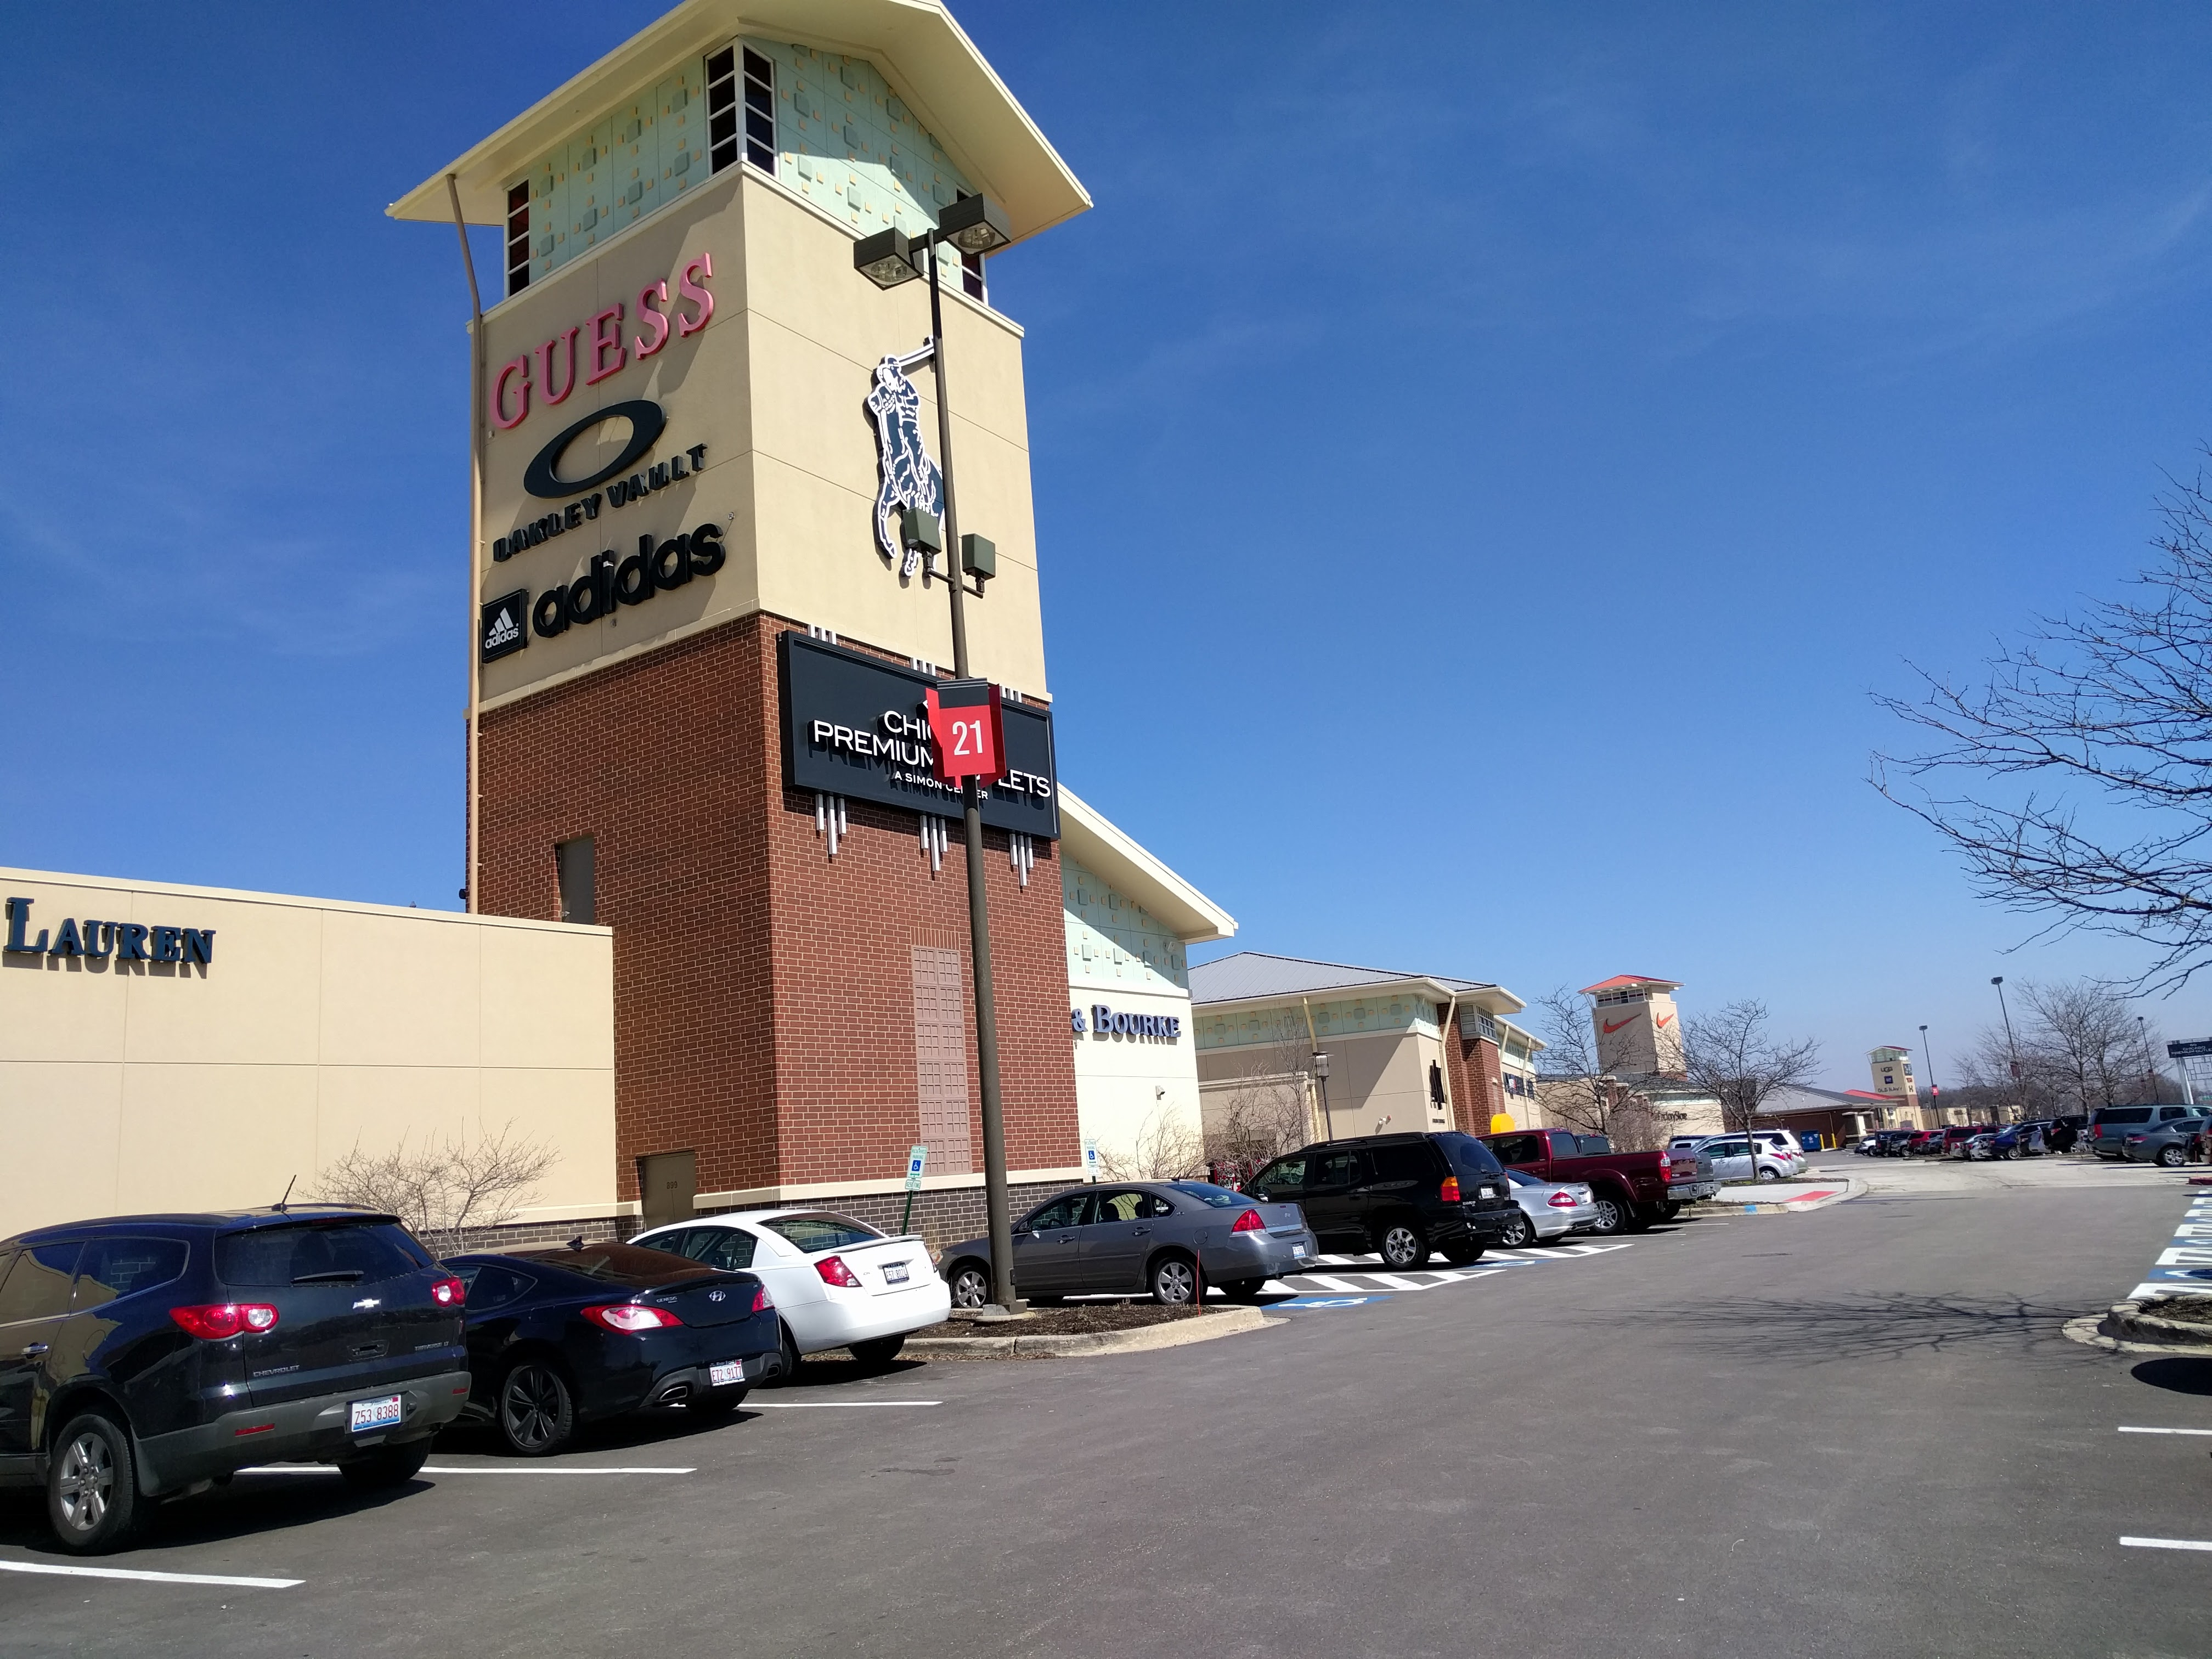 frangia Remissione Predictor  The Chicago Premium Outlets | Malls and Retail Wiki | Fandom